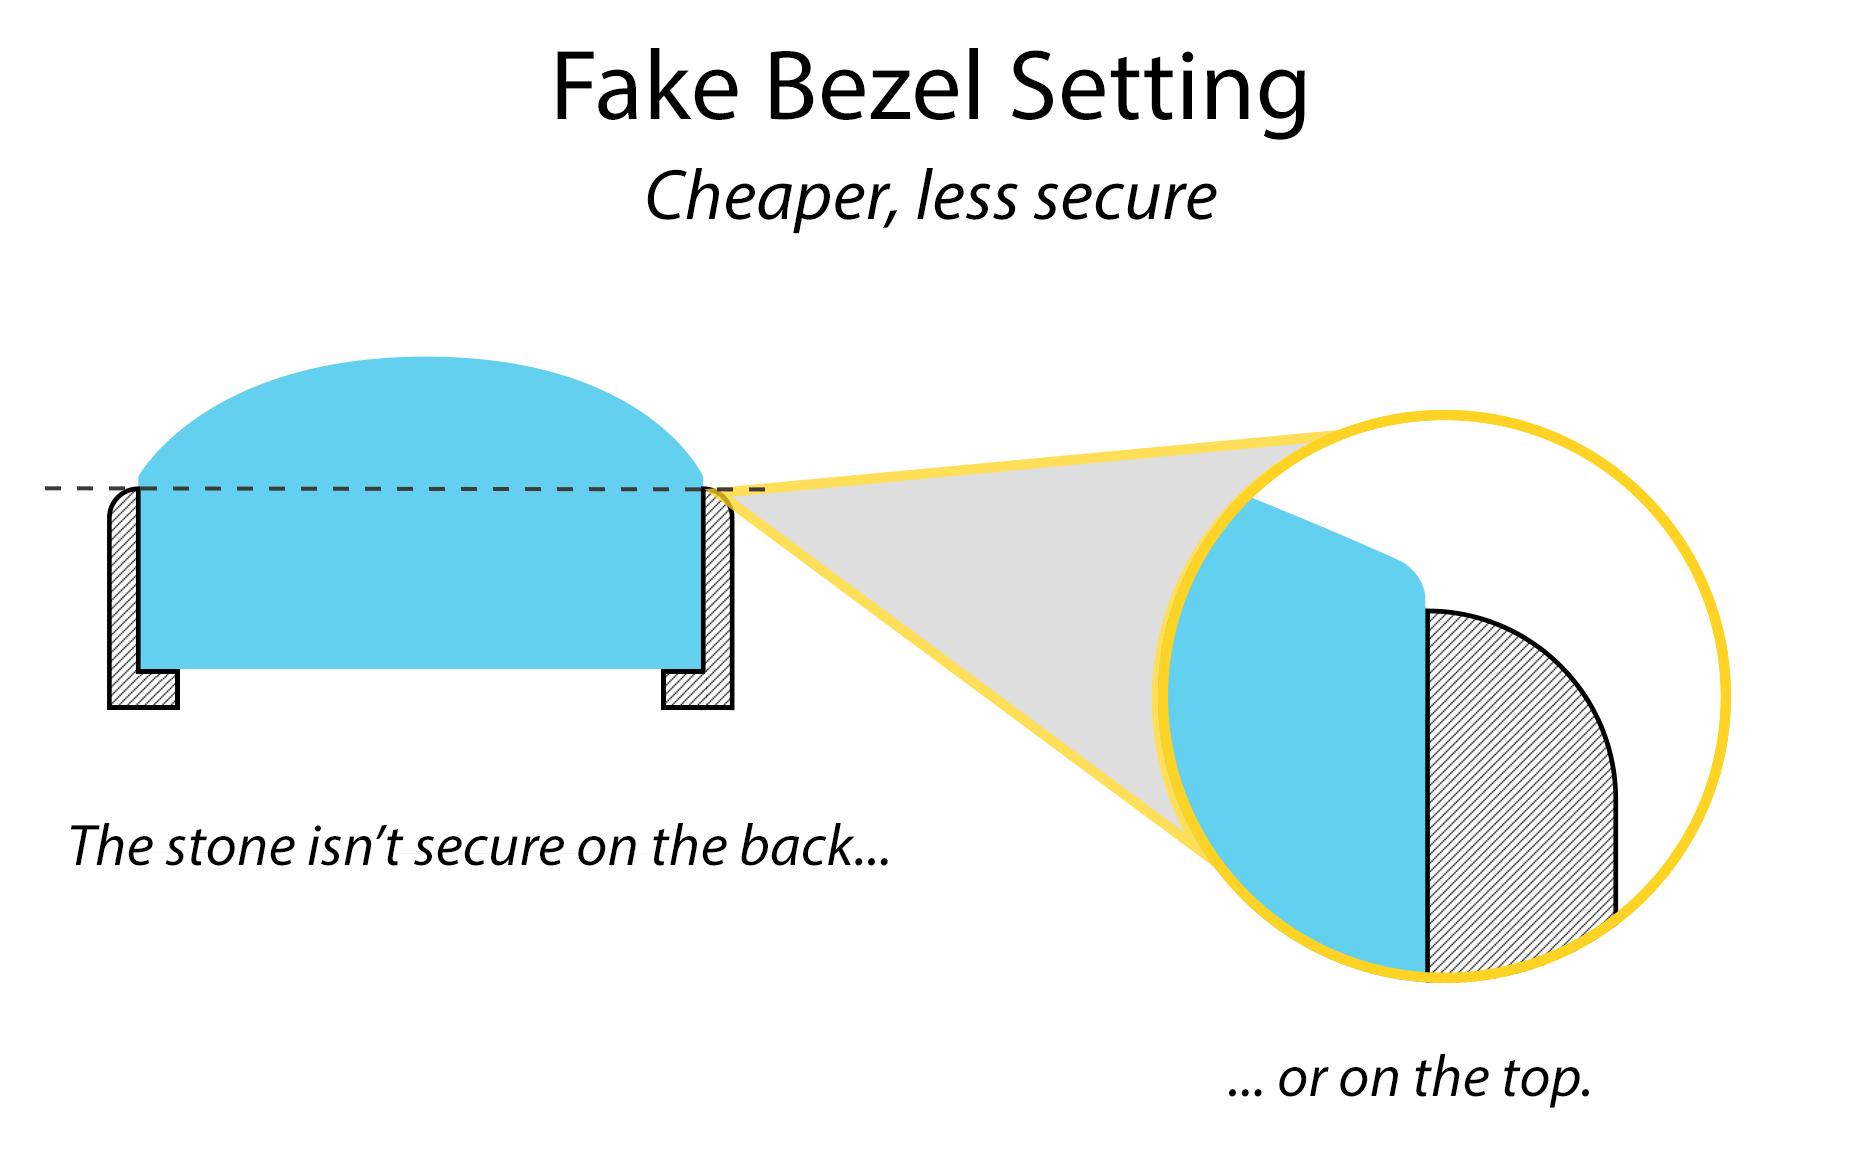 Fake Bezel, a cheaper way to set gemstone jewelry